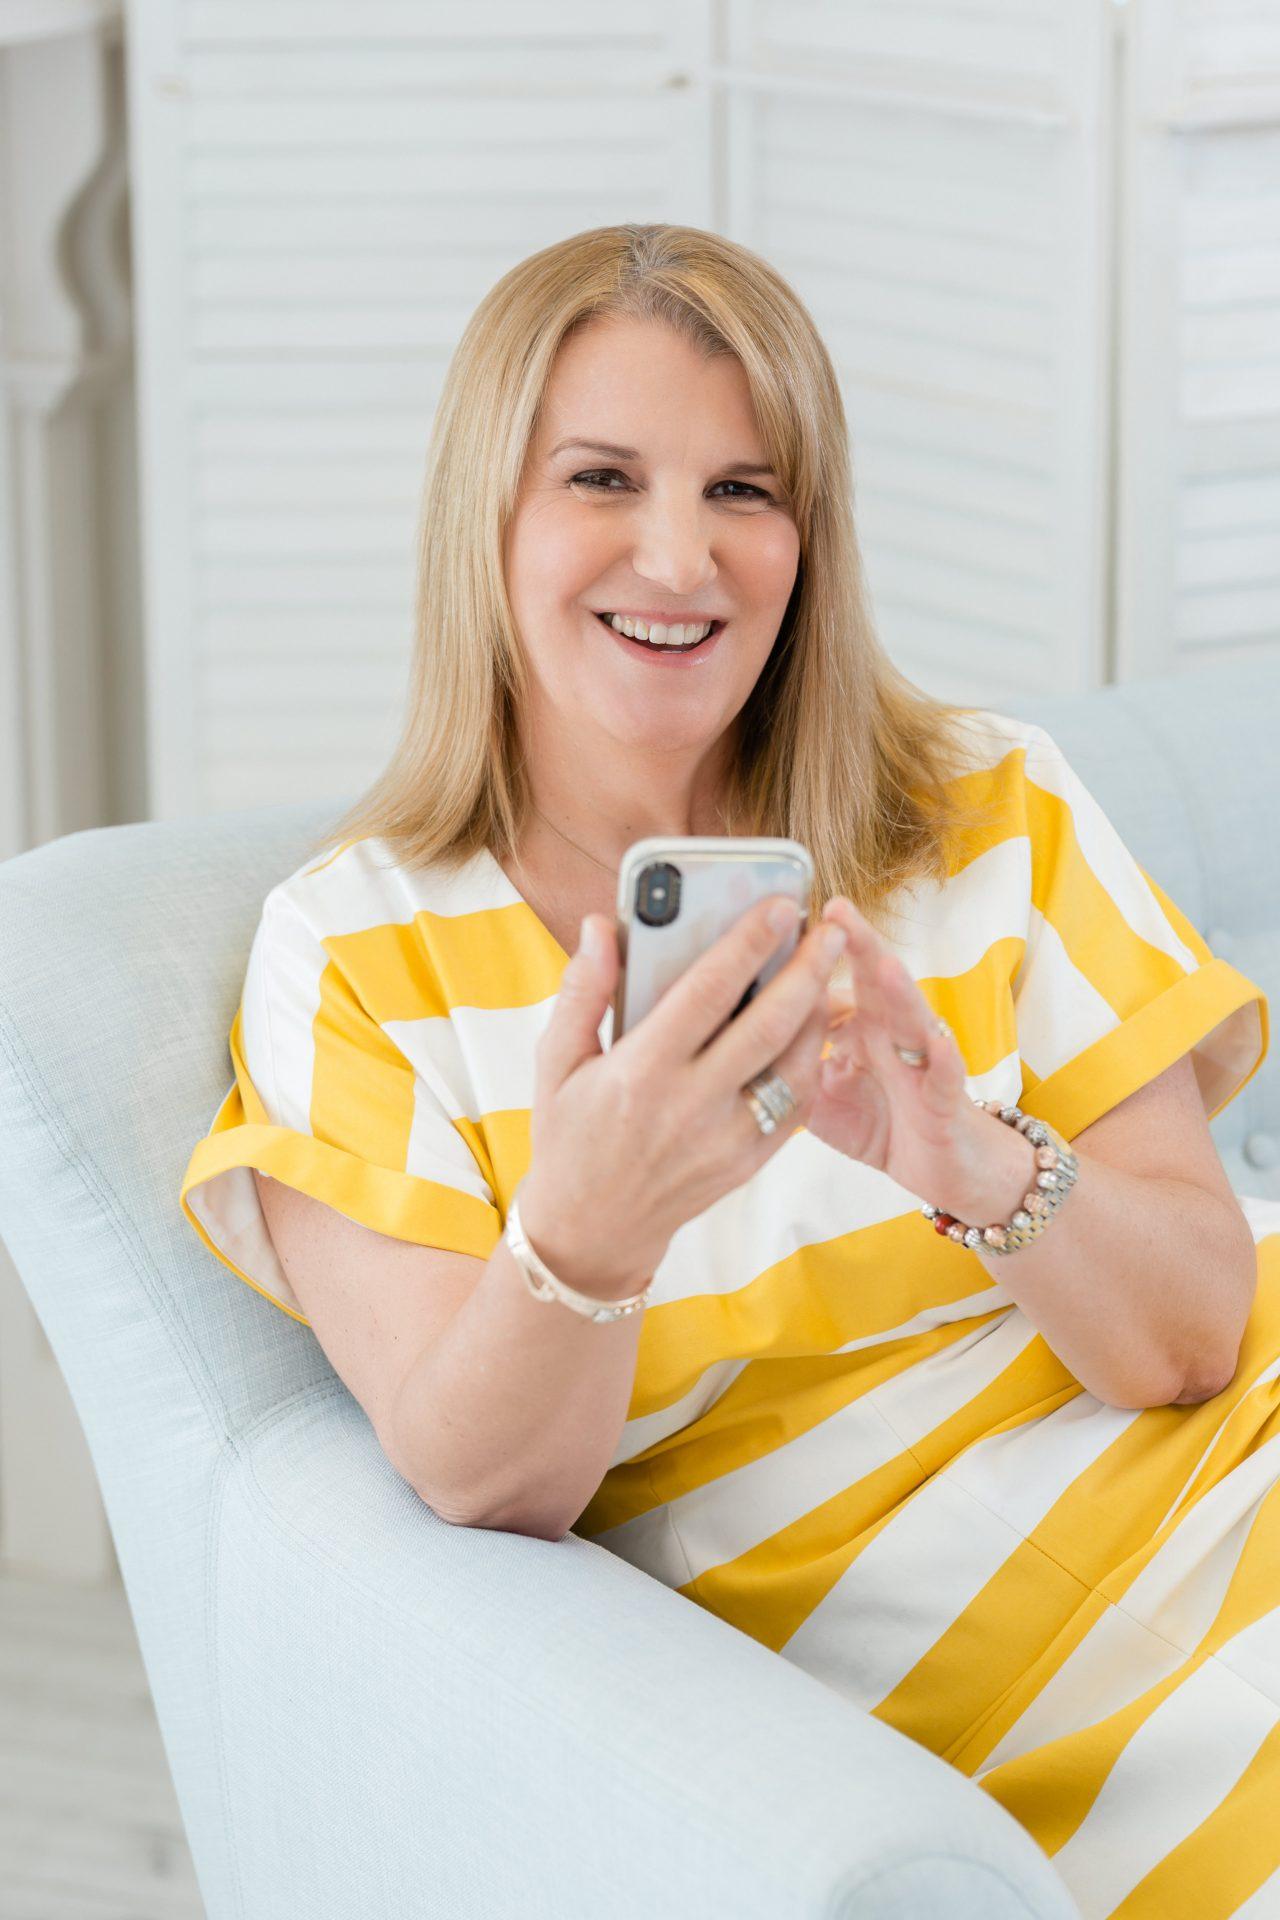 Yvette Craig by Kate Hennessy Business & Branding Photographer Instagram Headshots